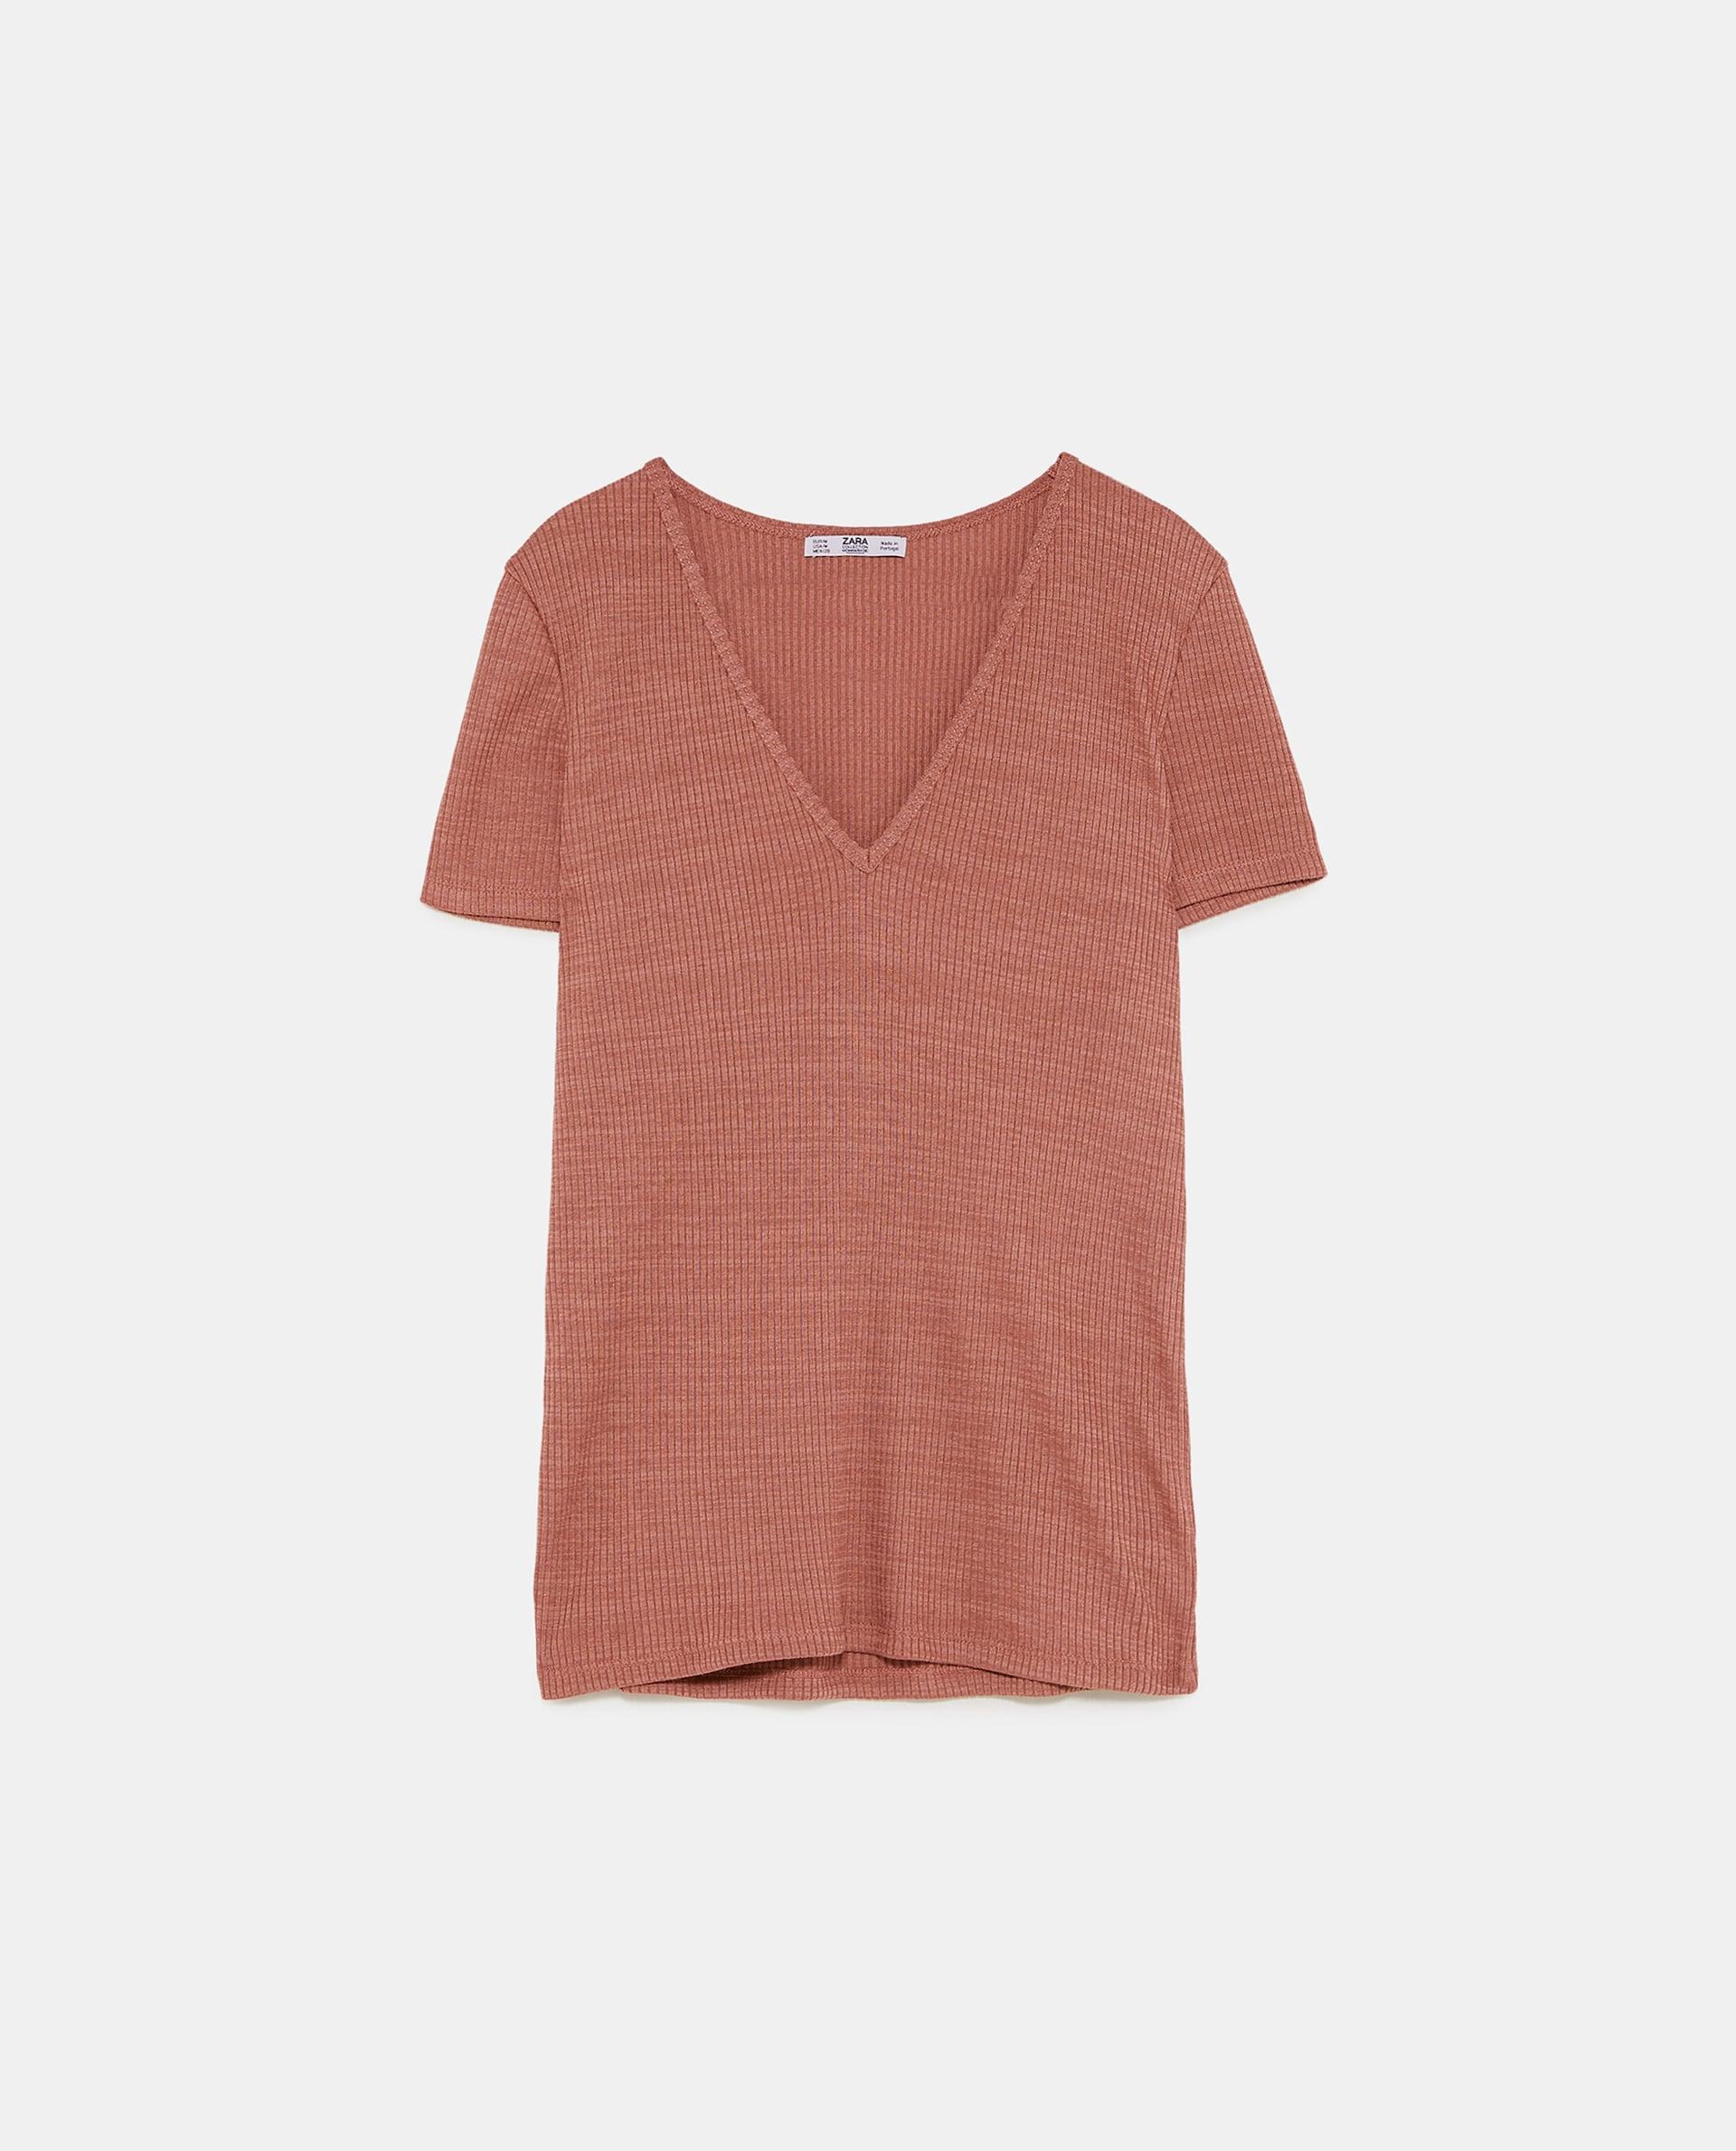 Zara ribbed top, brick, £12.99